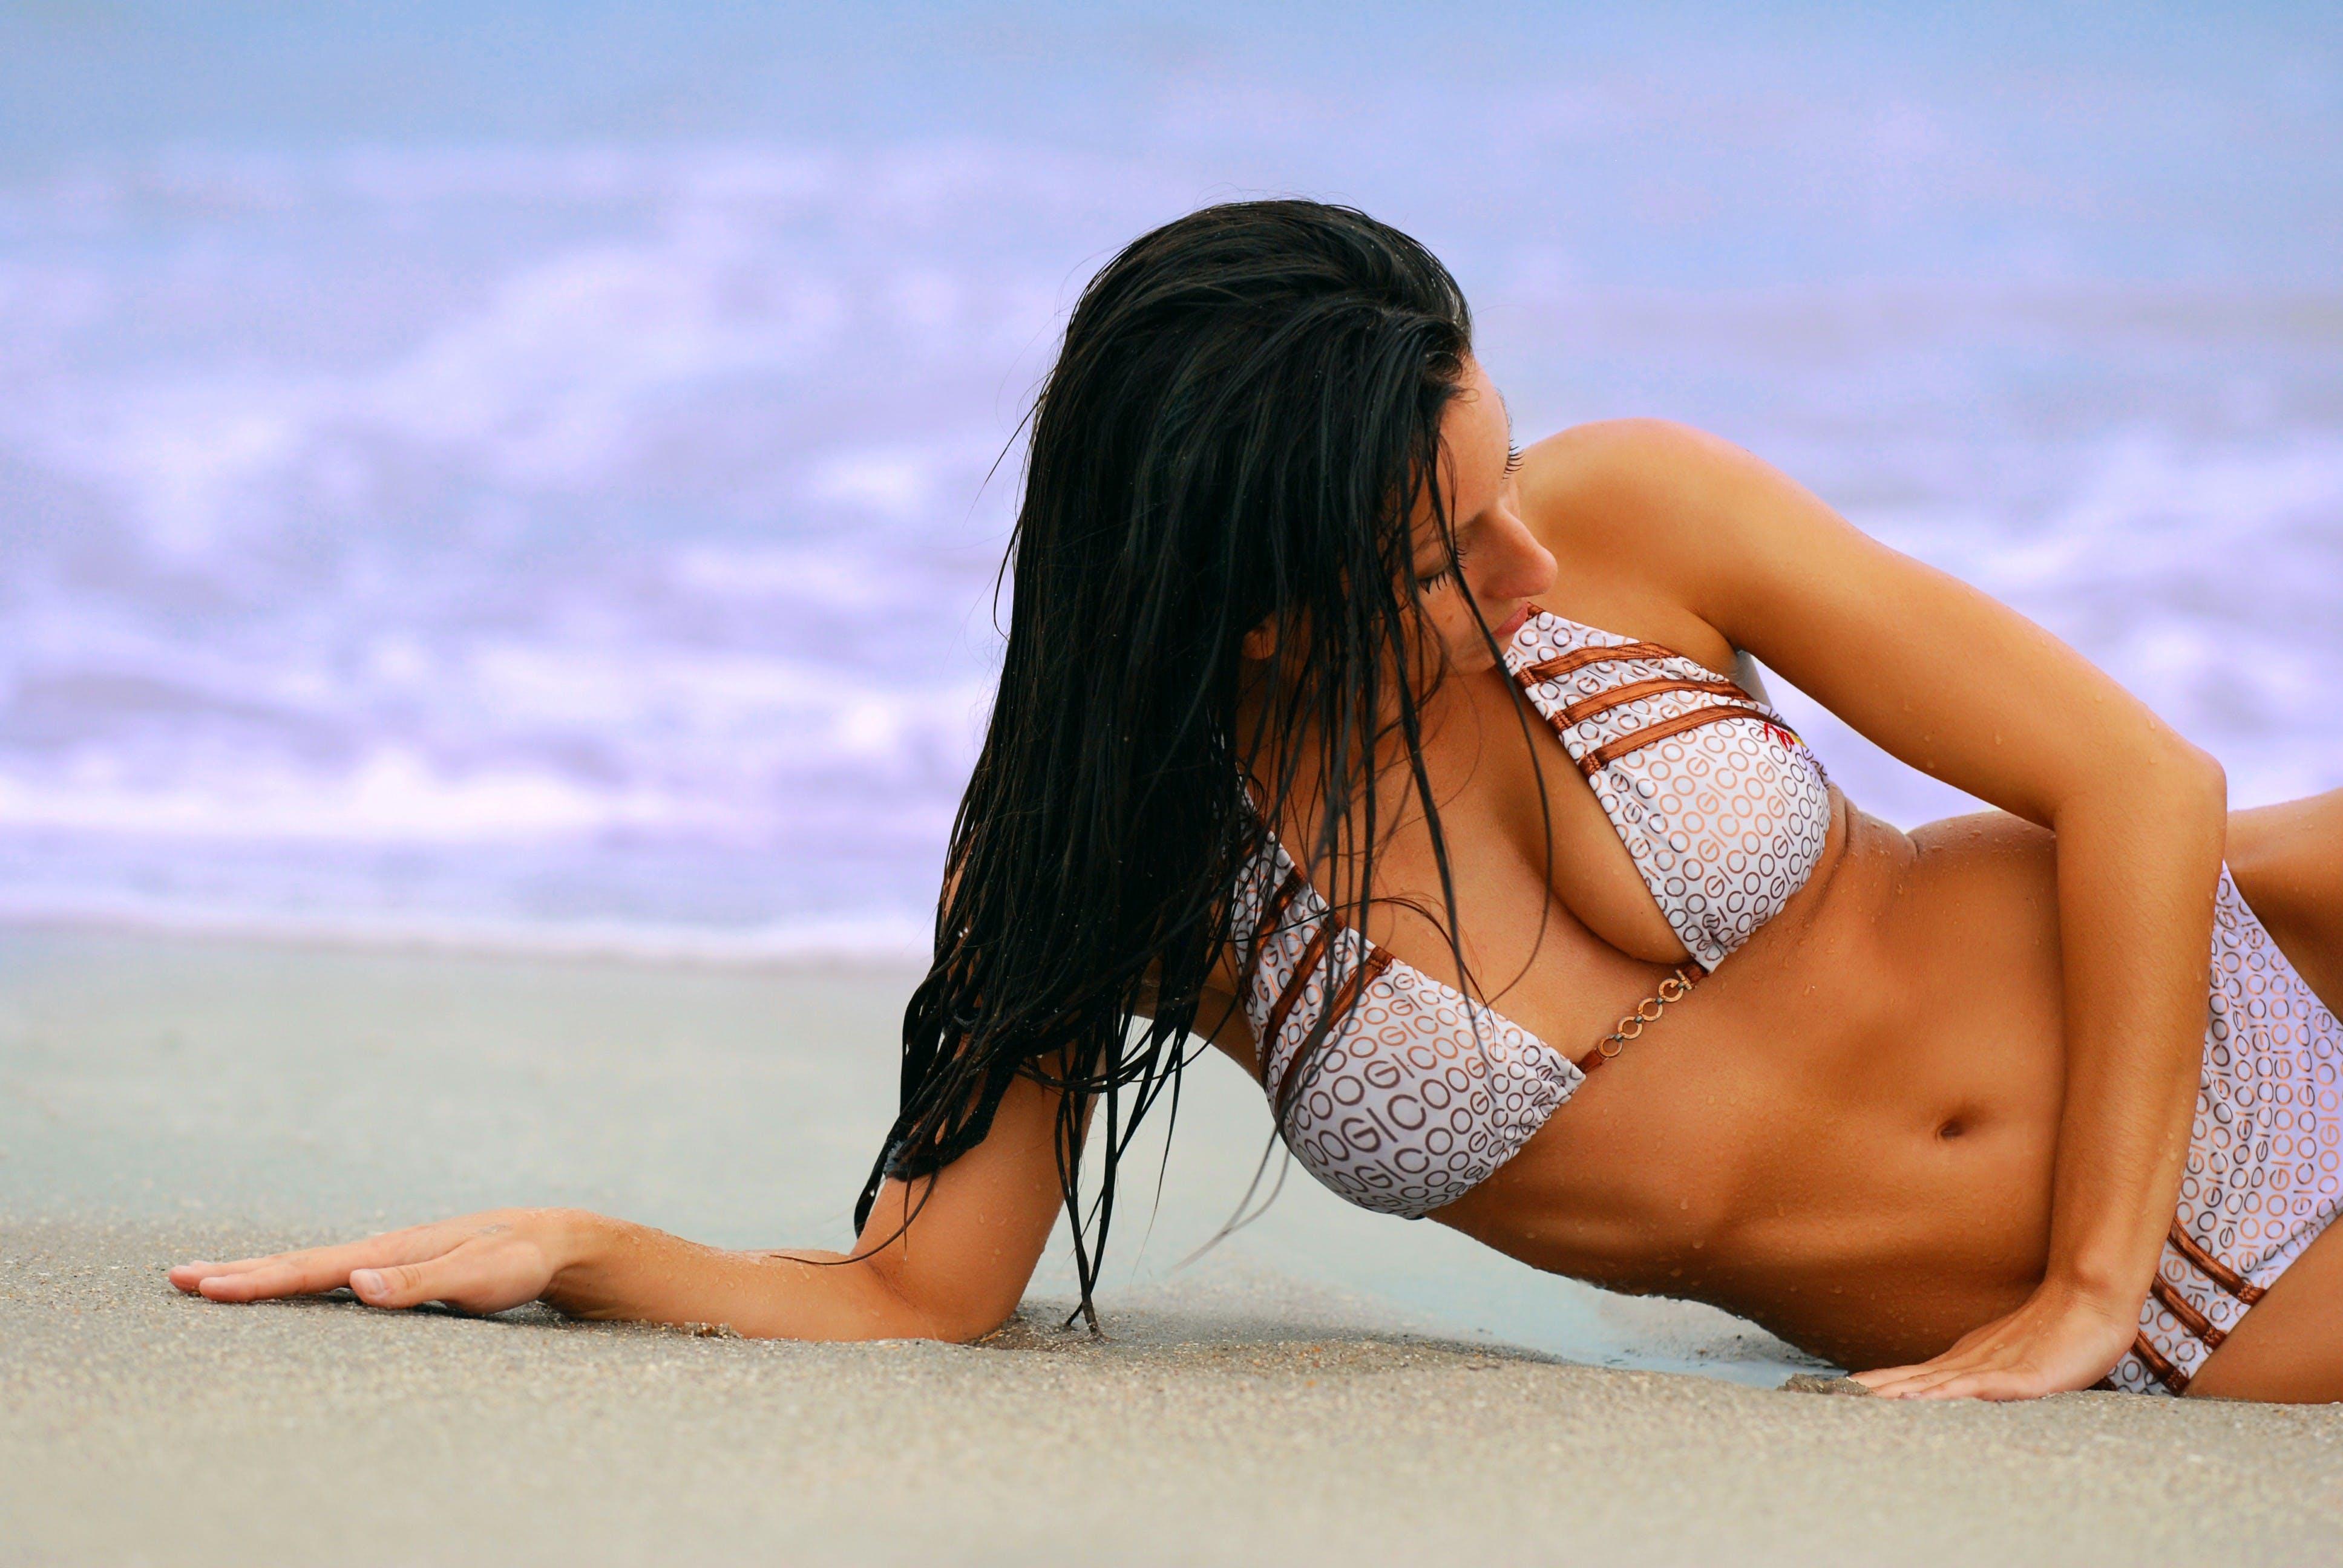 Kostenloses Stock Foto zu badeanzug, bikini, frau, körper